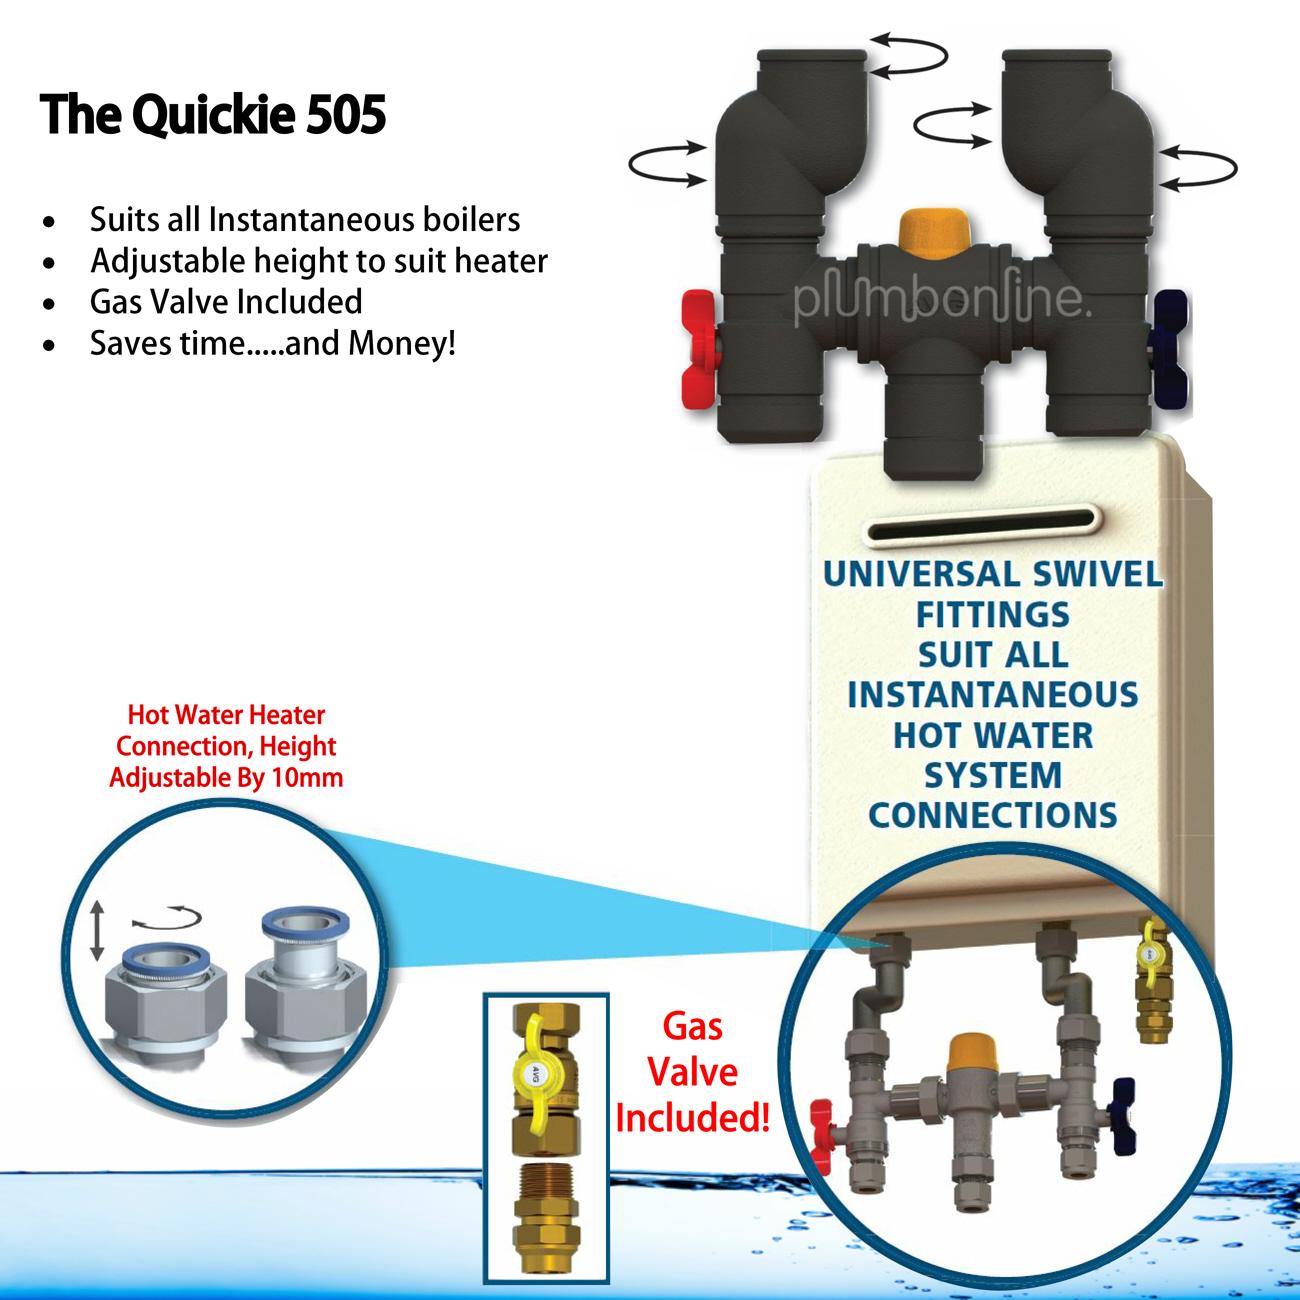 qik505-gas-continuous-flow-install-kit-with-burner-v1.2.jpg